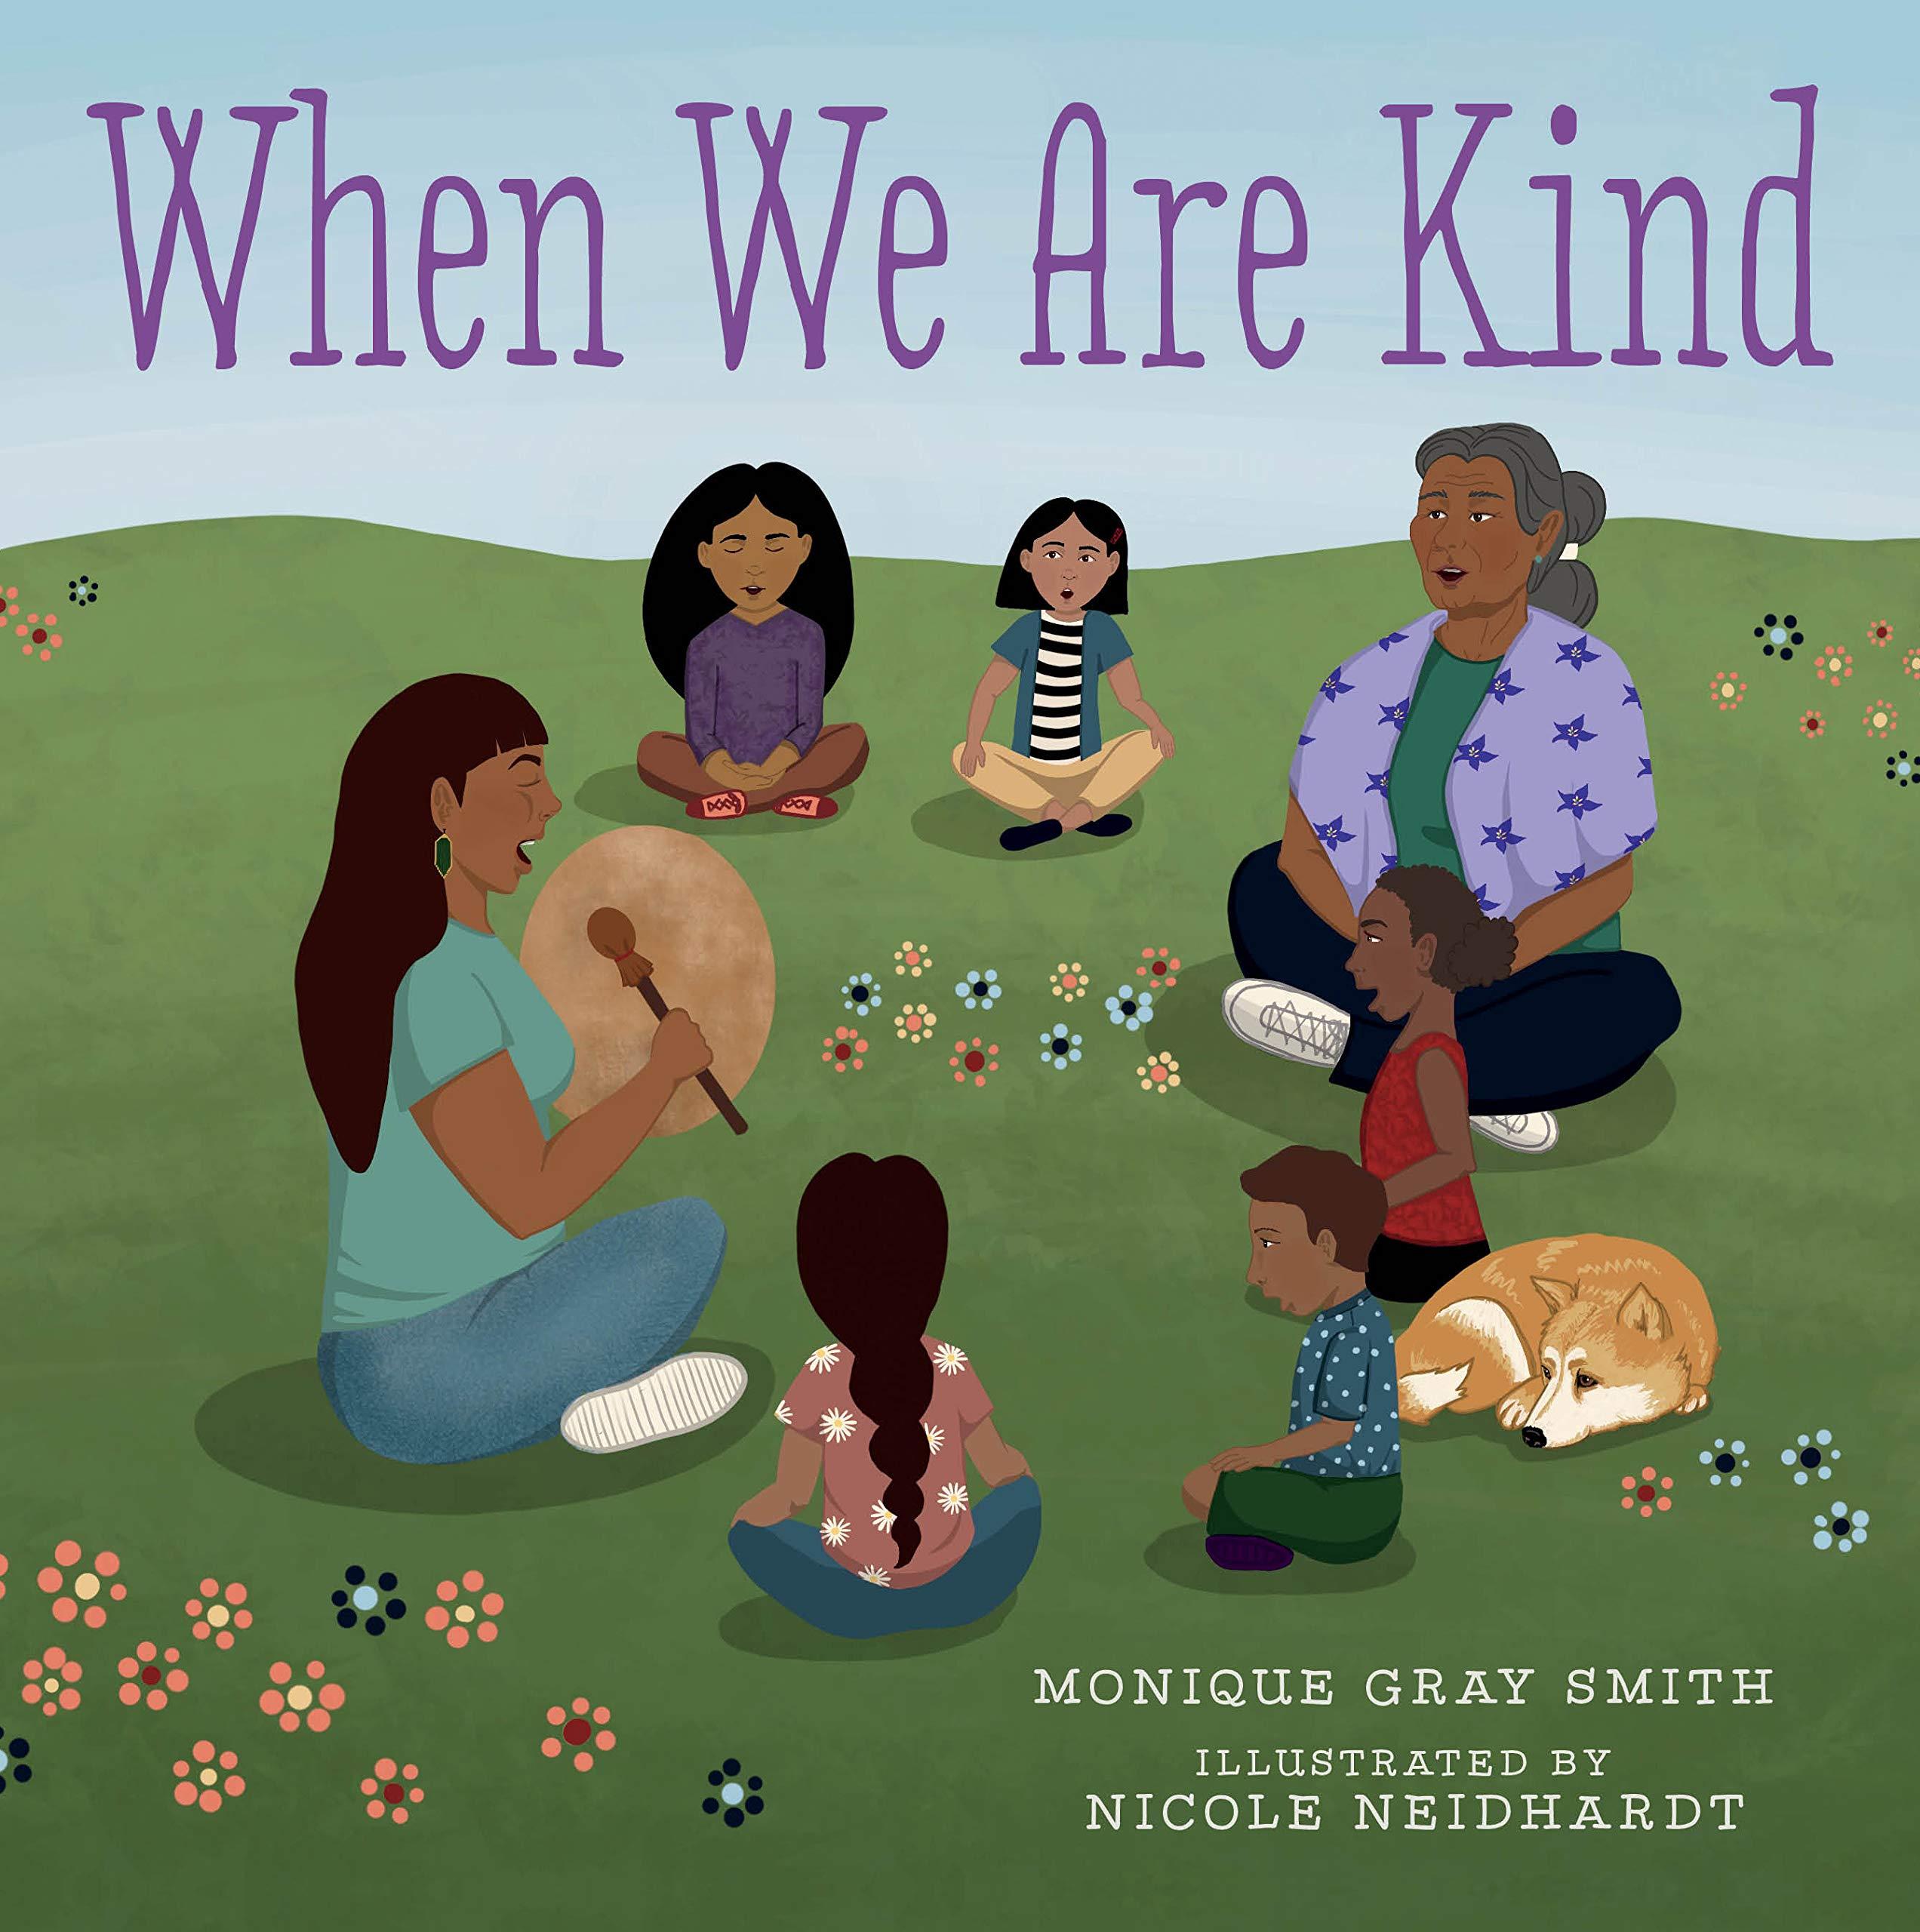 When We Are Kind: Smith, Monique Gray, Neidhardt, Nicole: 9781459825222: Books - Amazon.ca